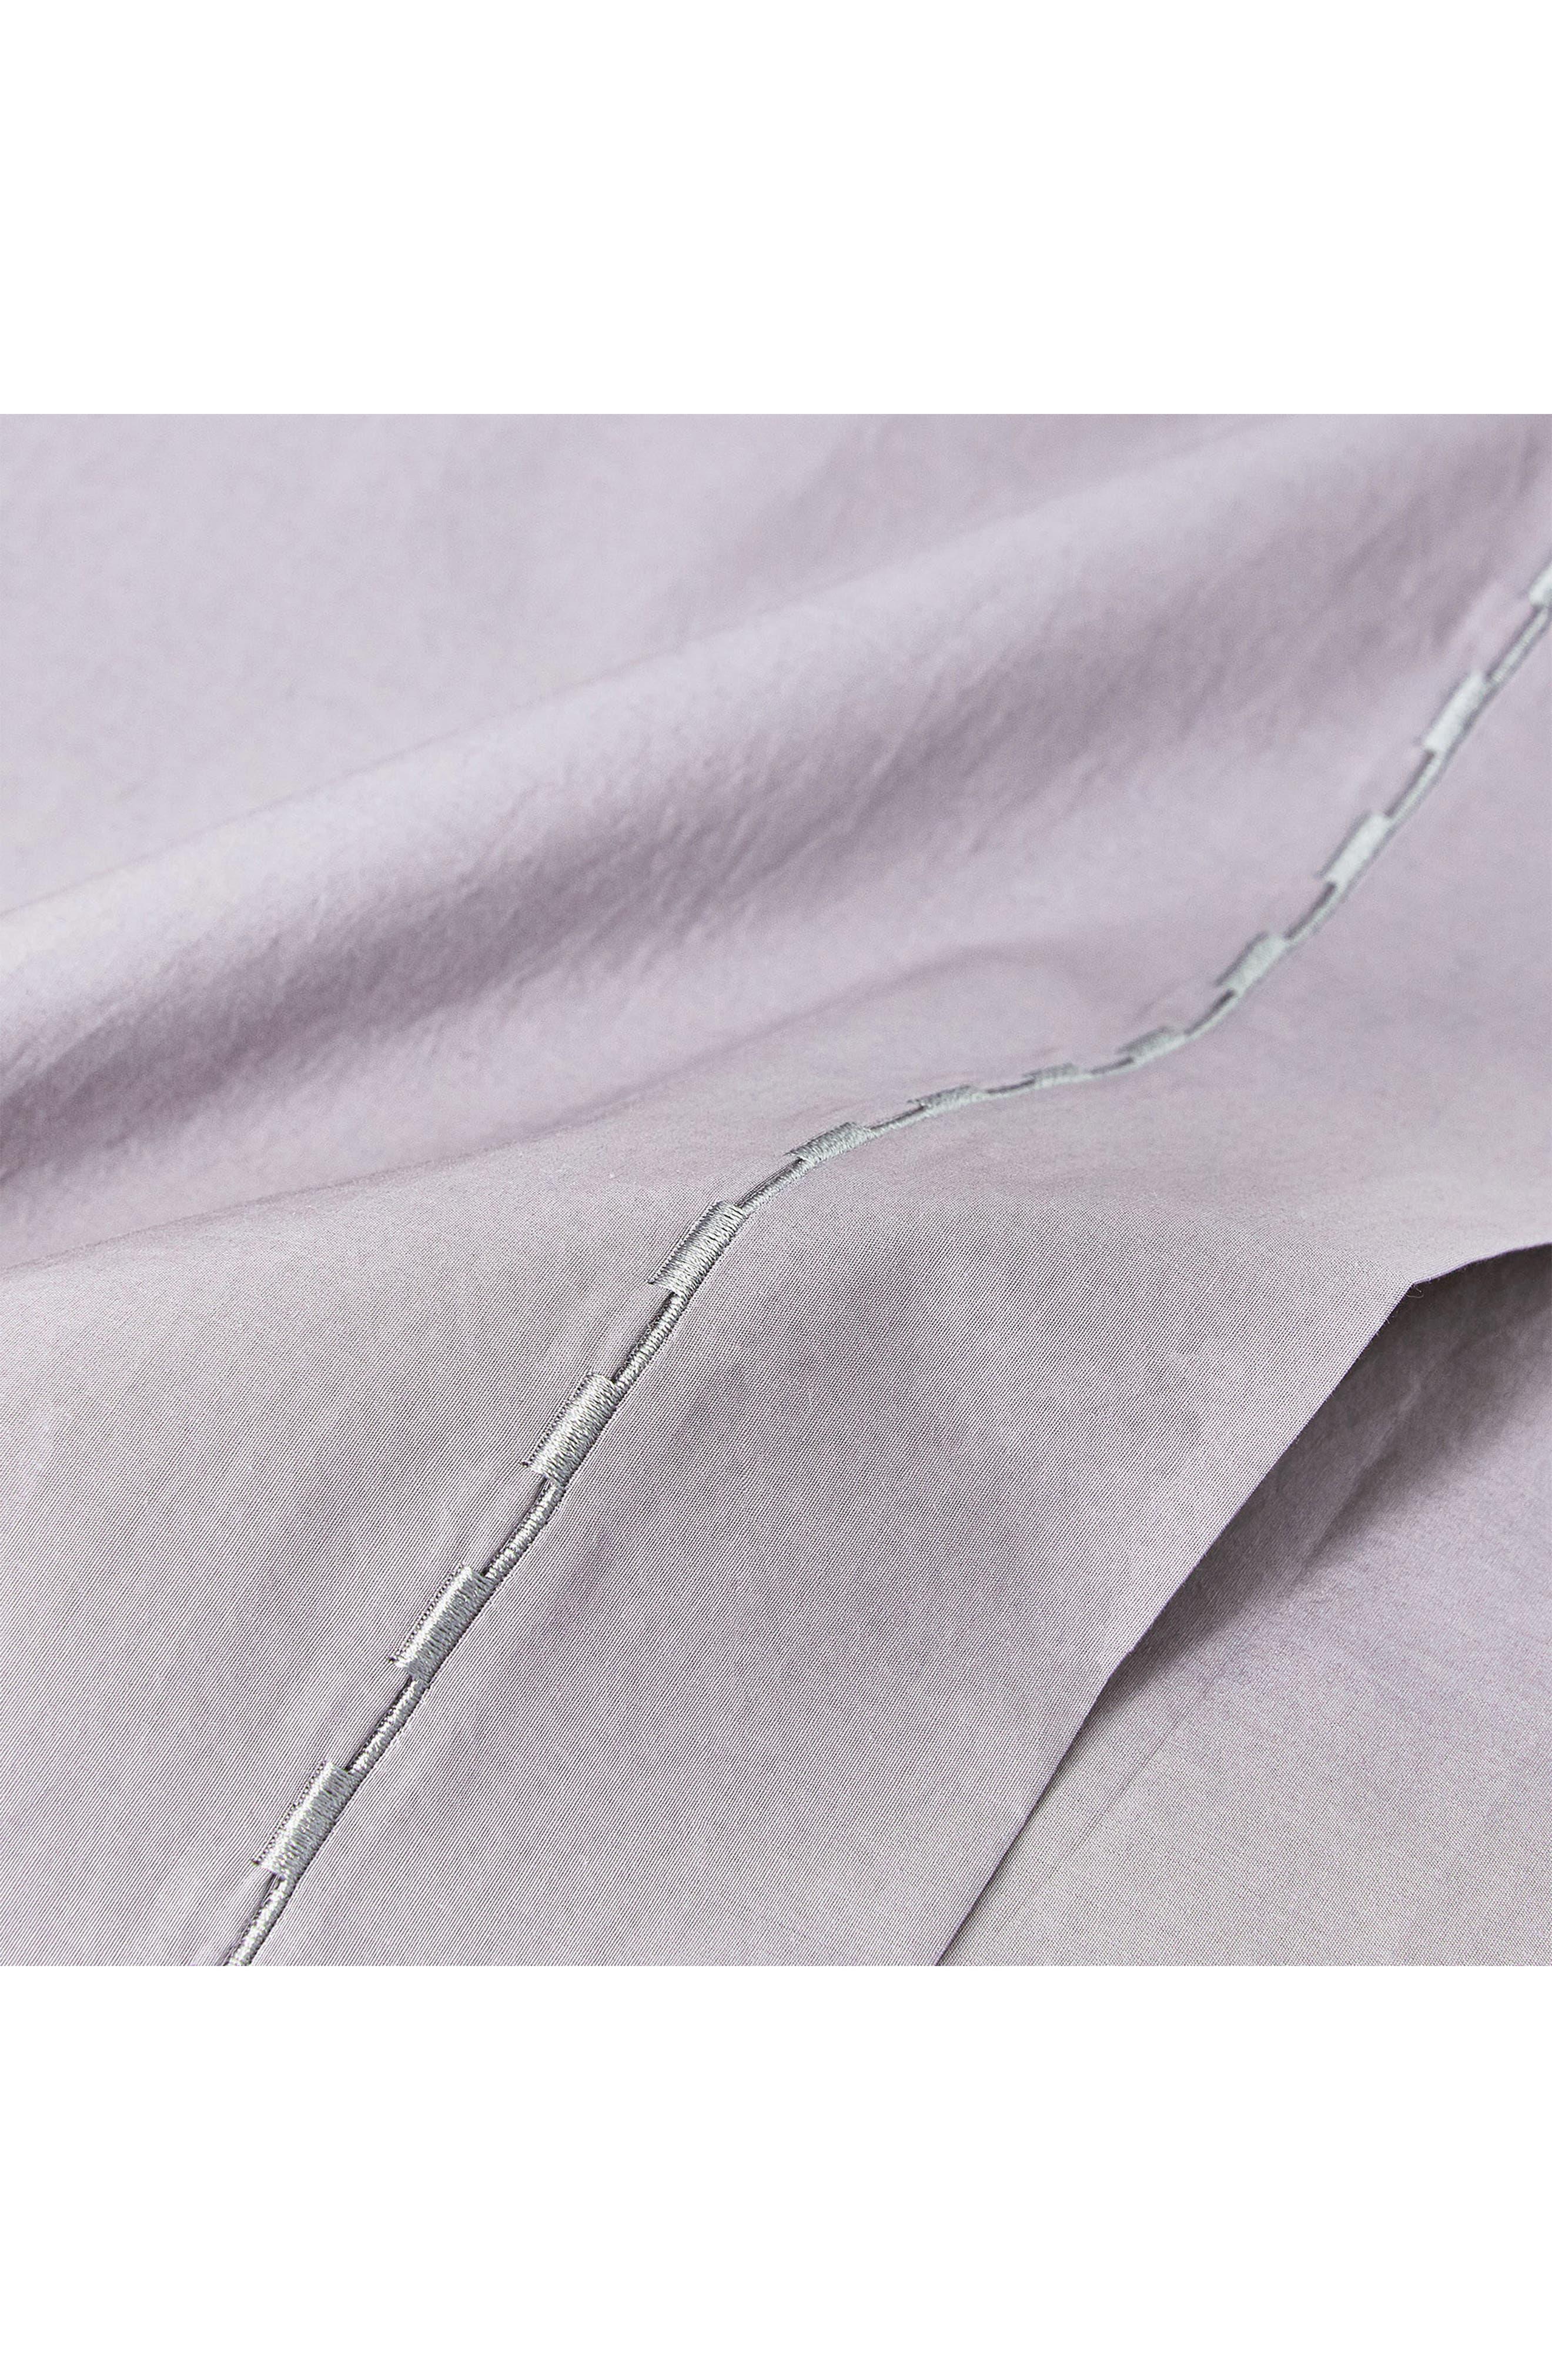 SPLENDID HOME DECOR,                             Spendid Home Decor Cotton Percale Pillowcases,                             Alternate thumbnail 2, color,                             MIST